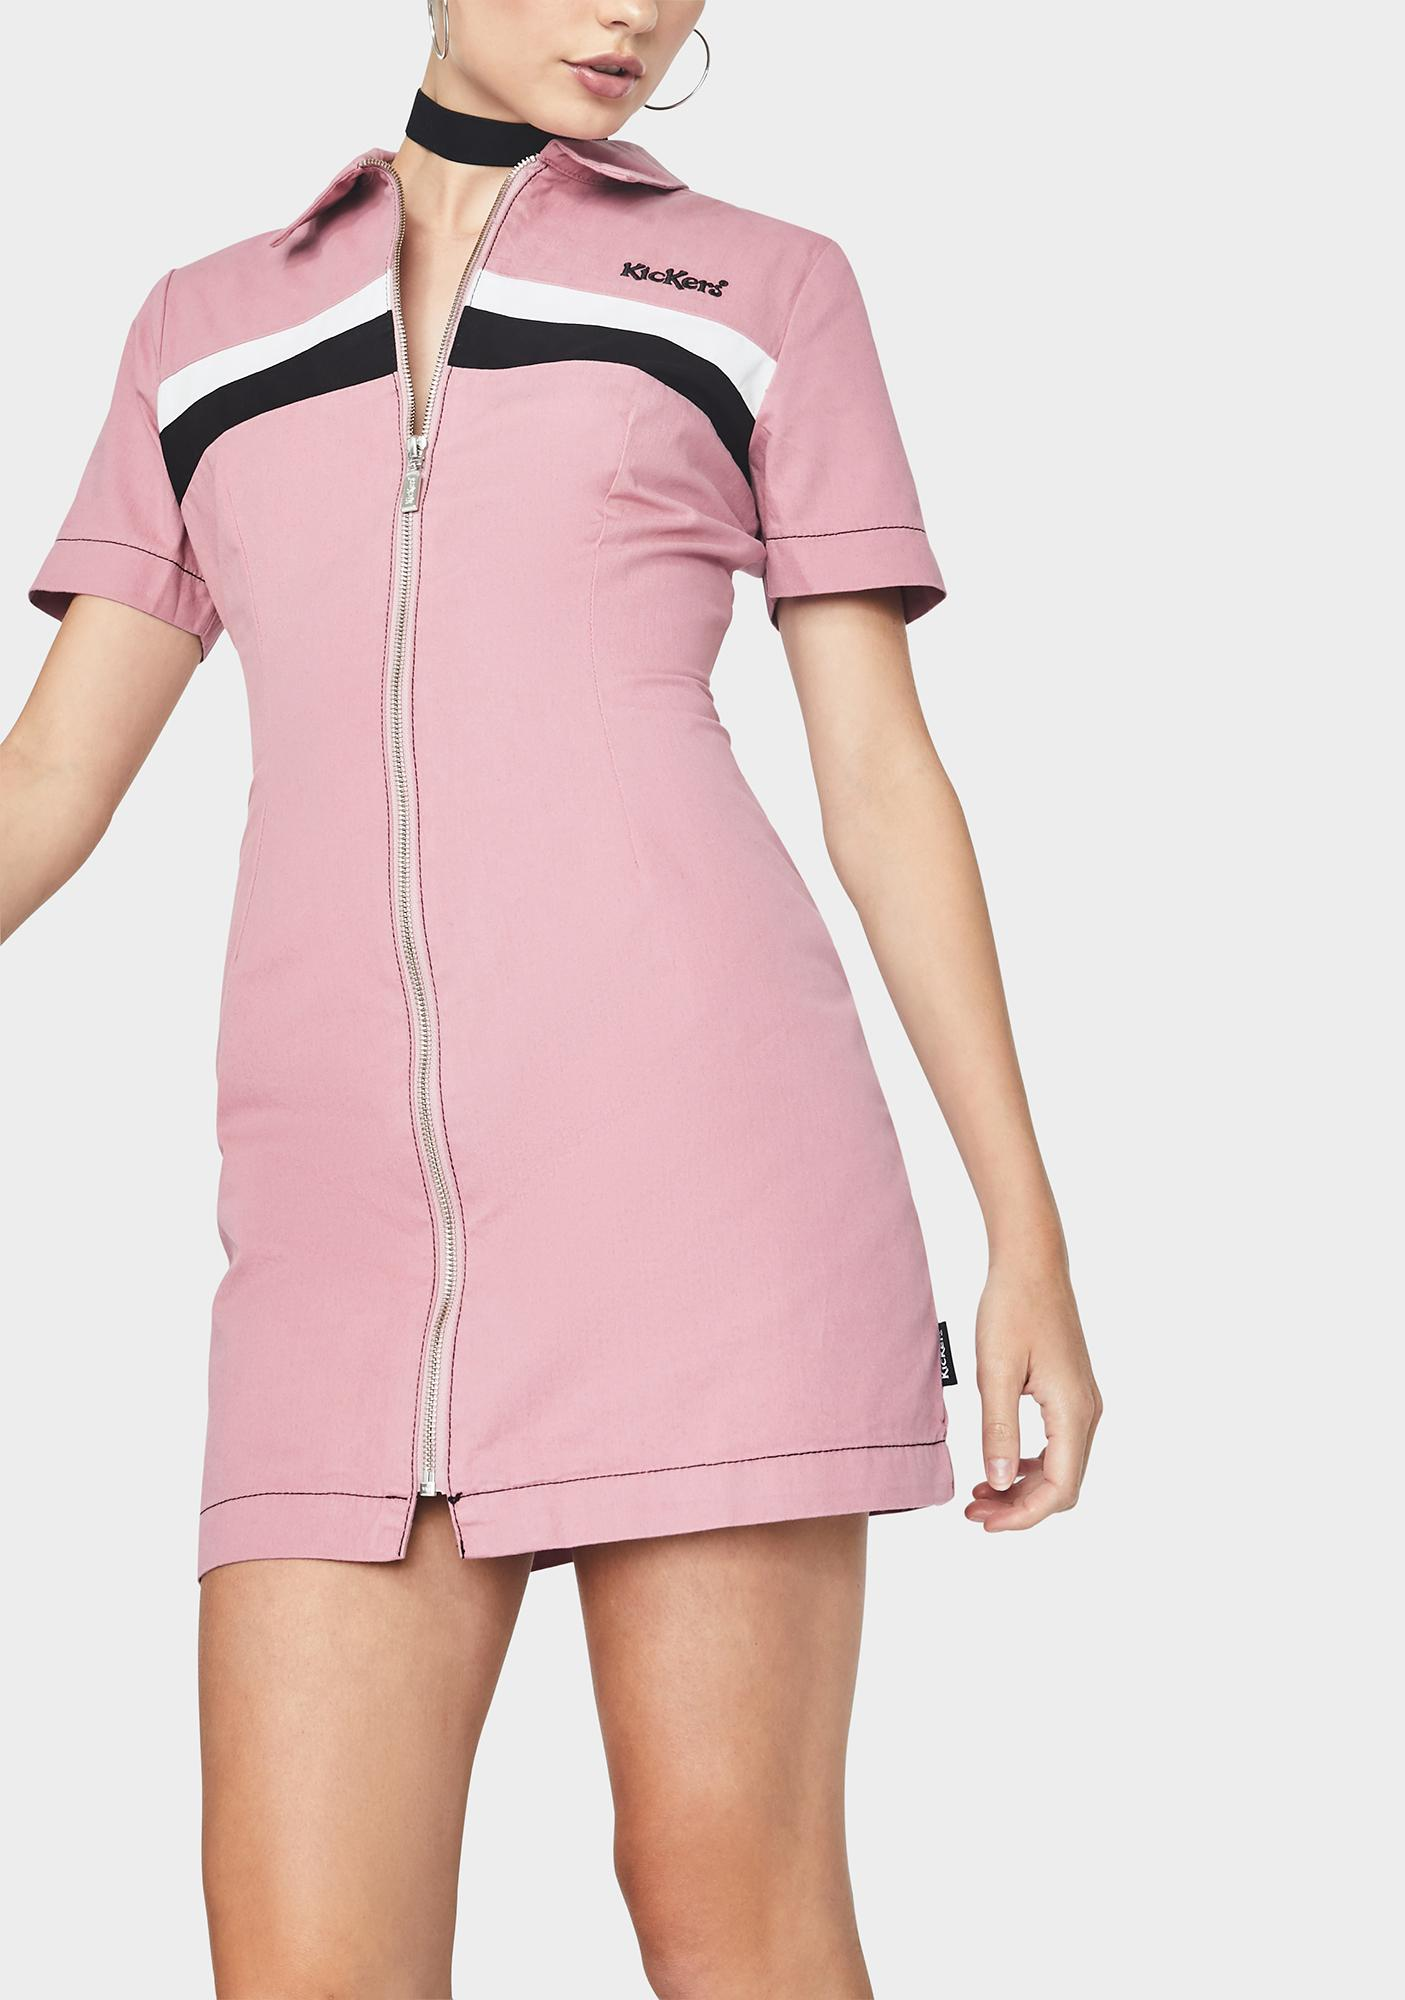 Kickers Stripe Panel Fitted Shirt Dress